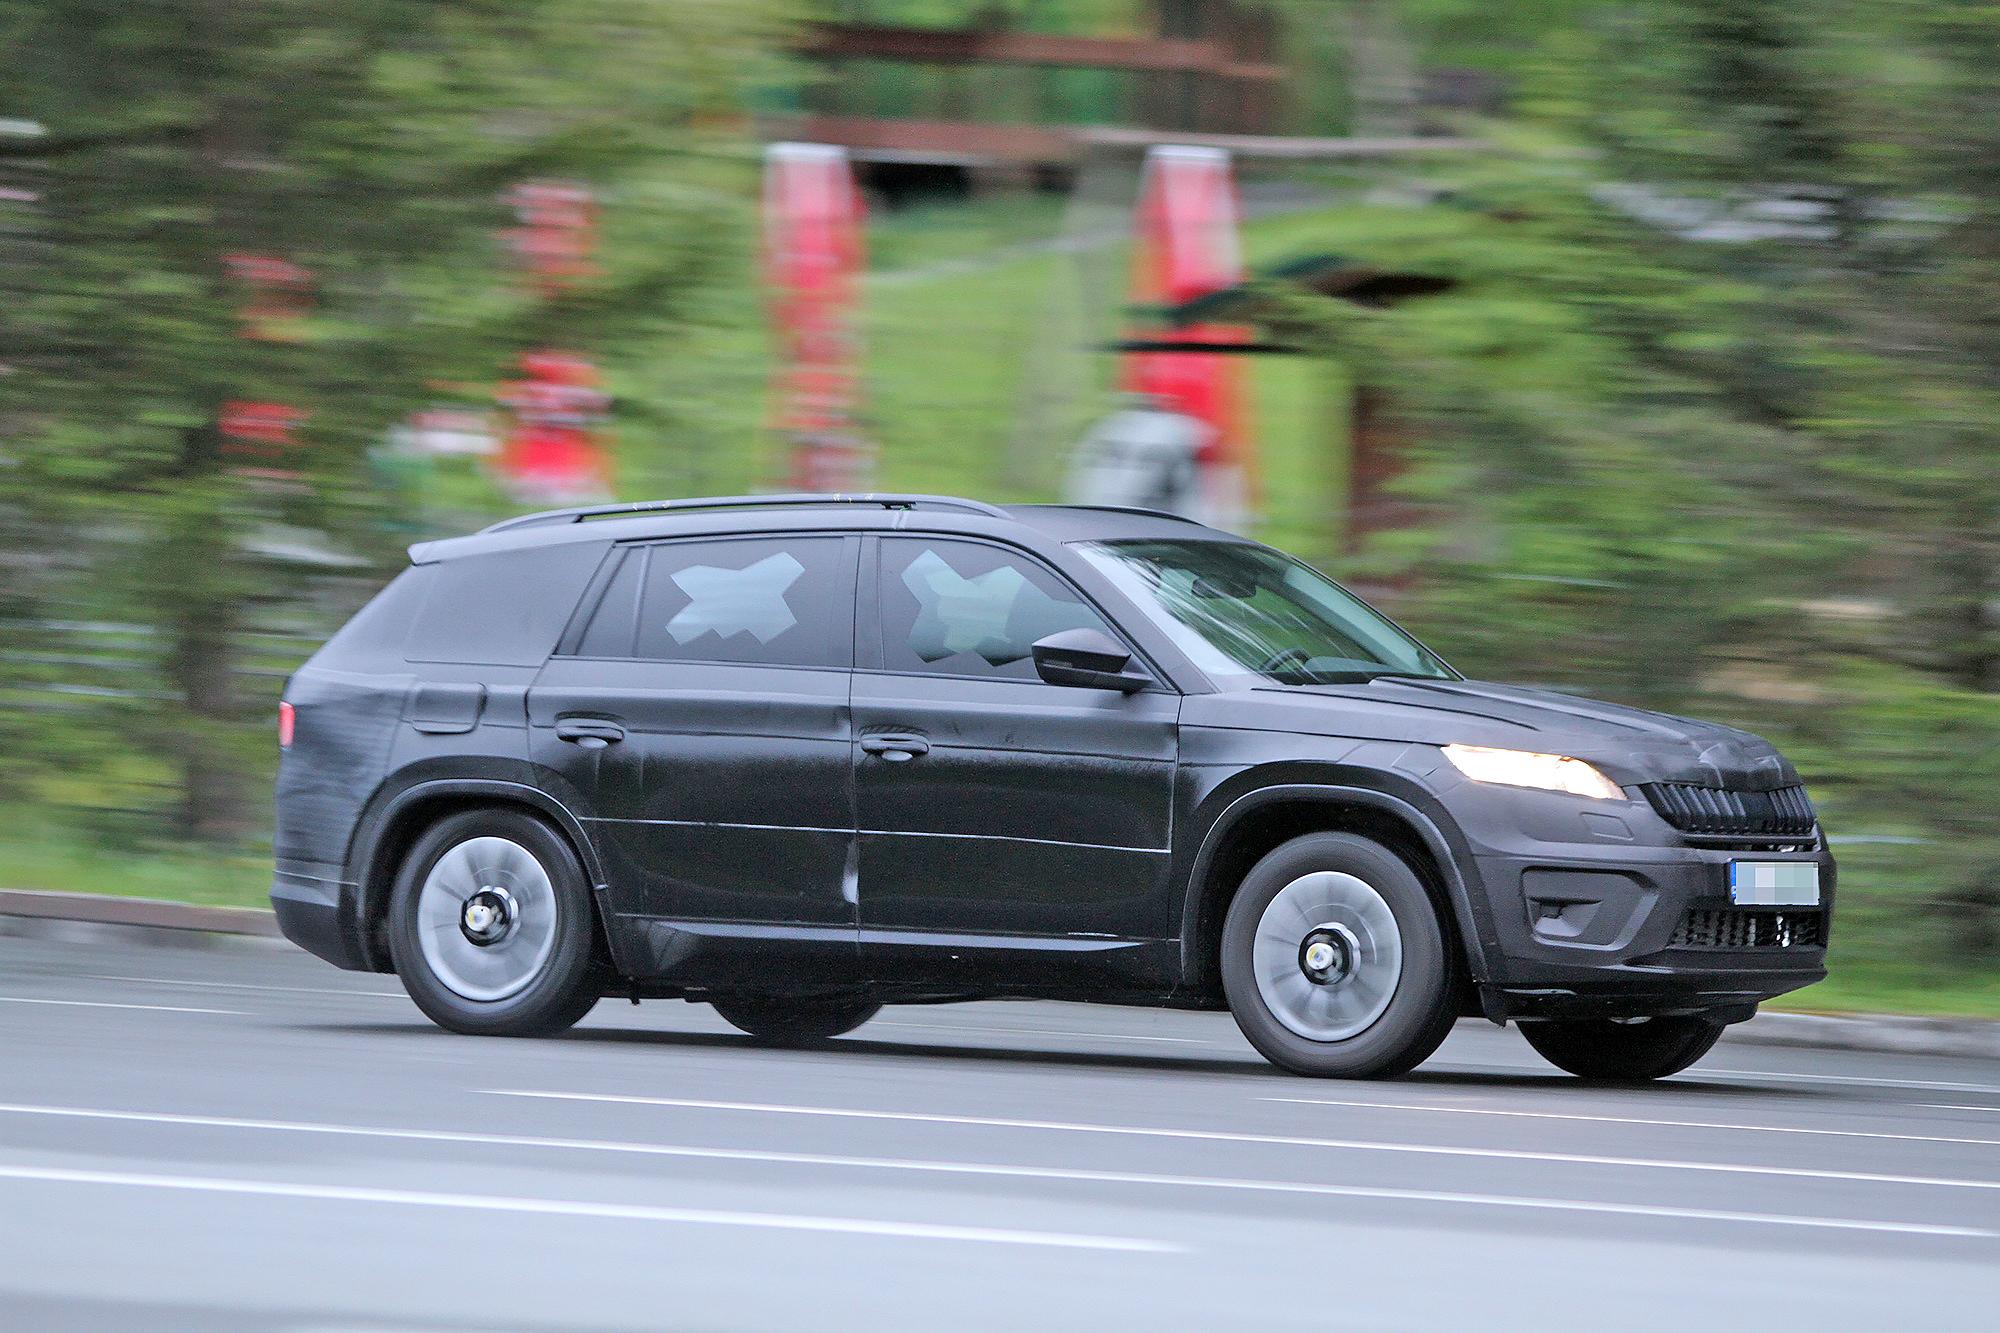 porsche 911 gt2 rs sets scary quick nurburgring lap. Black Bedroom Furniture Sets. Home Design Ideas